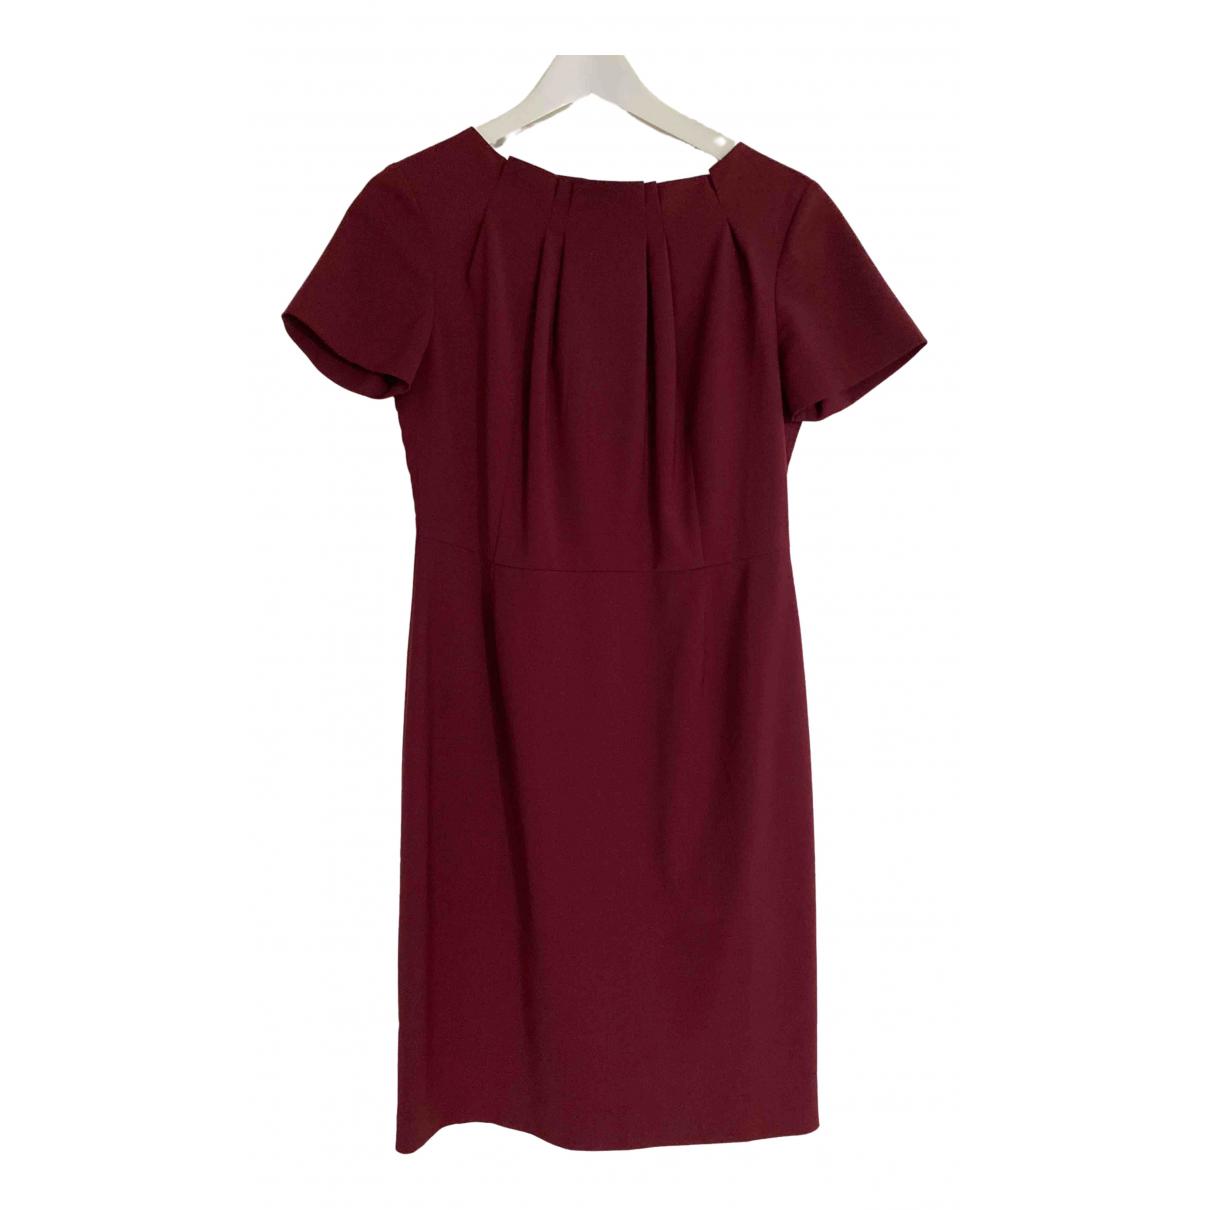 Sand \N Burgundy Wool dress for Women 38 FR